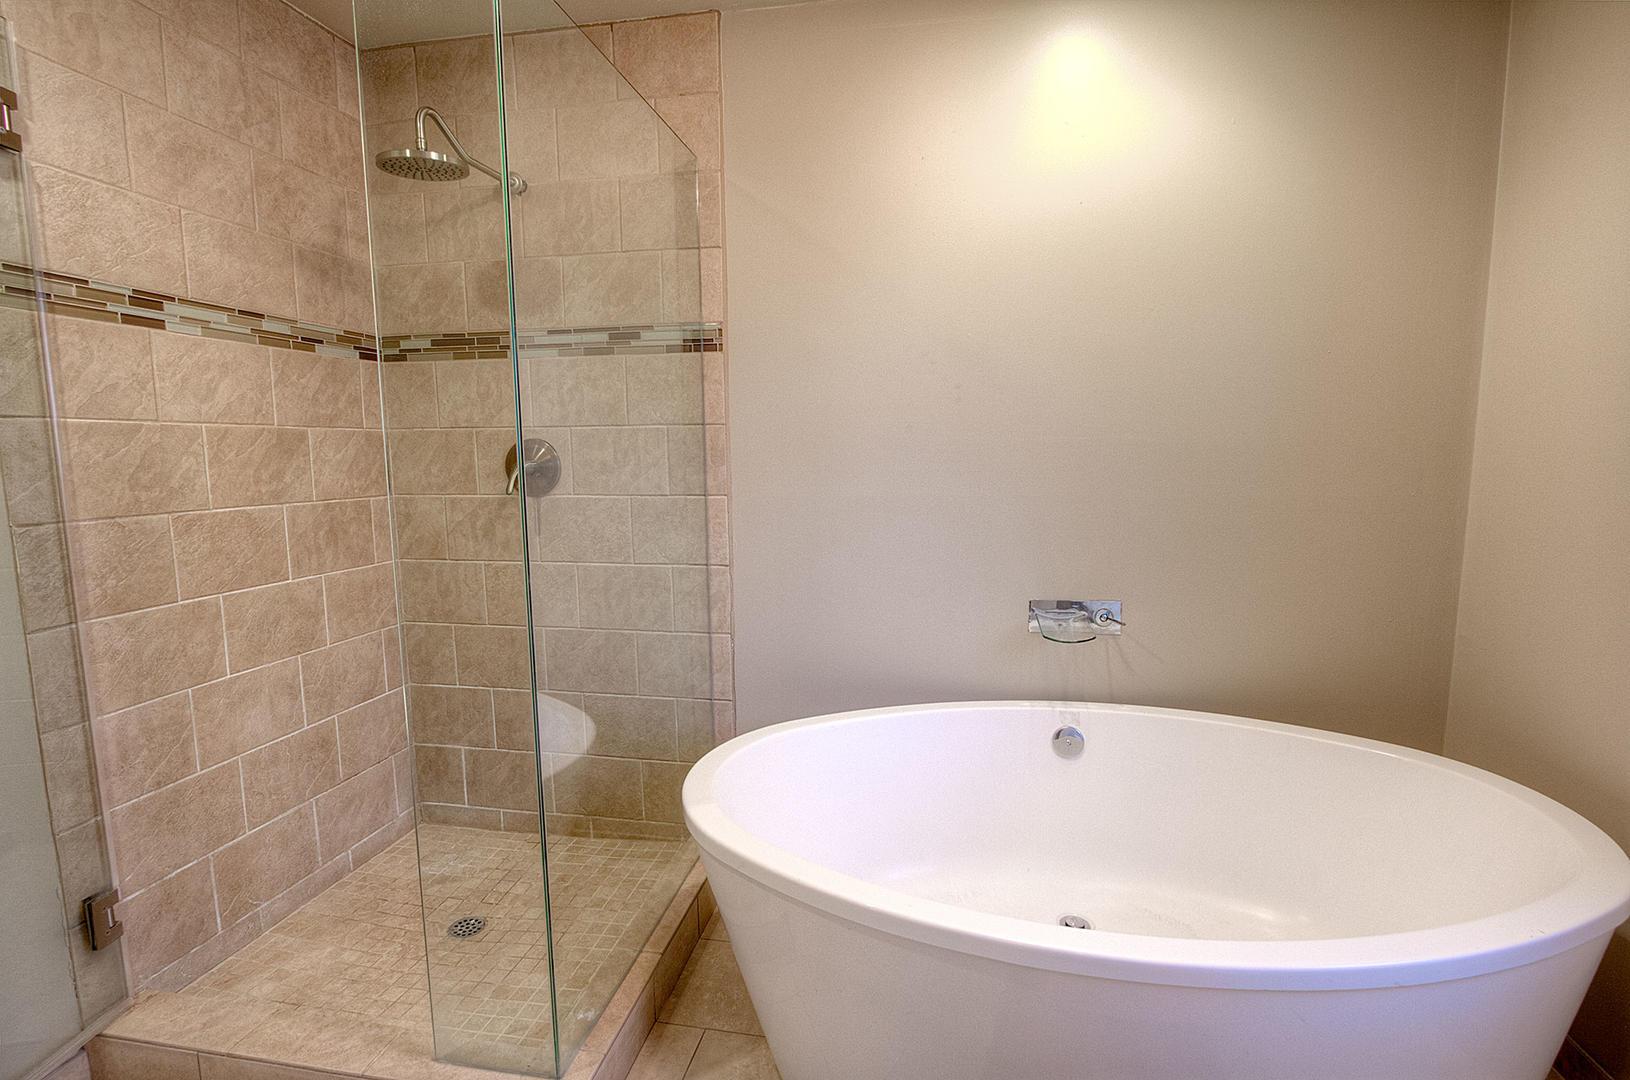 nvh0870 bath tub